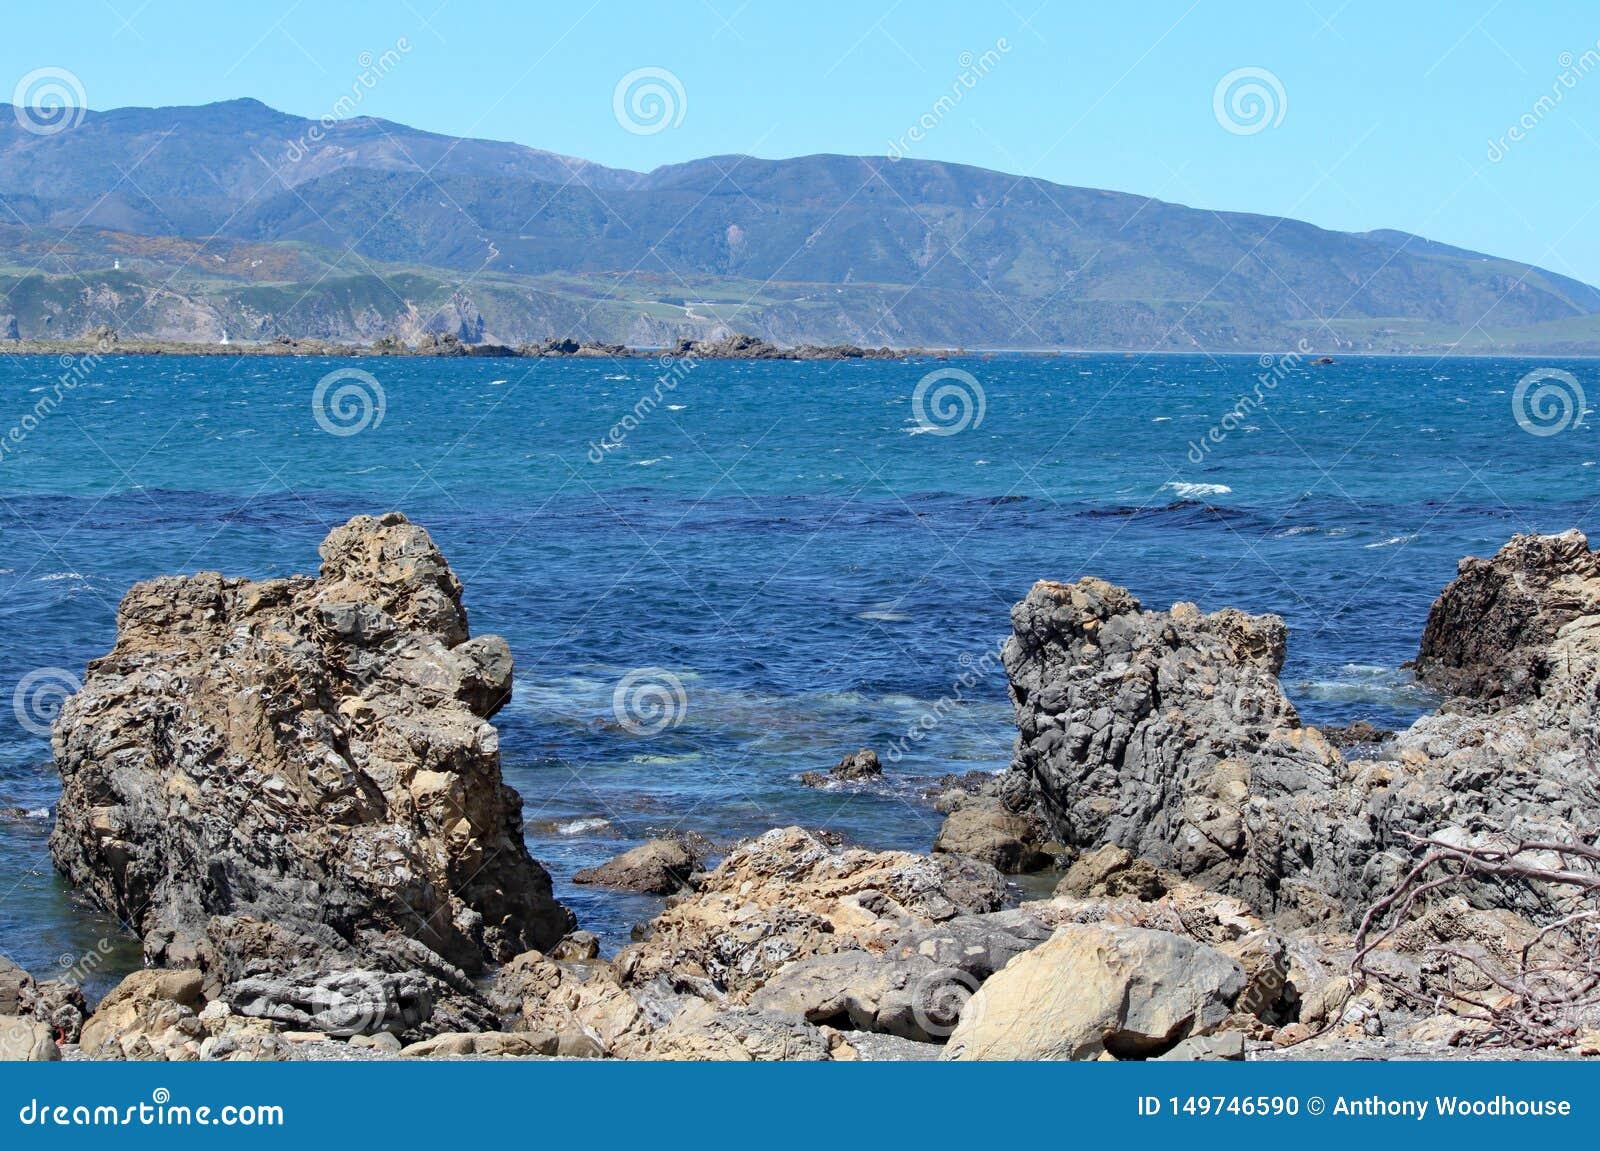 Rochas entalhadas na borda da baía em Wellington, Nova Zelândia de Lyall